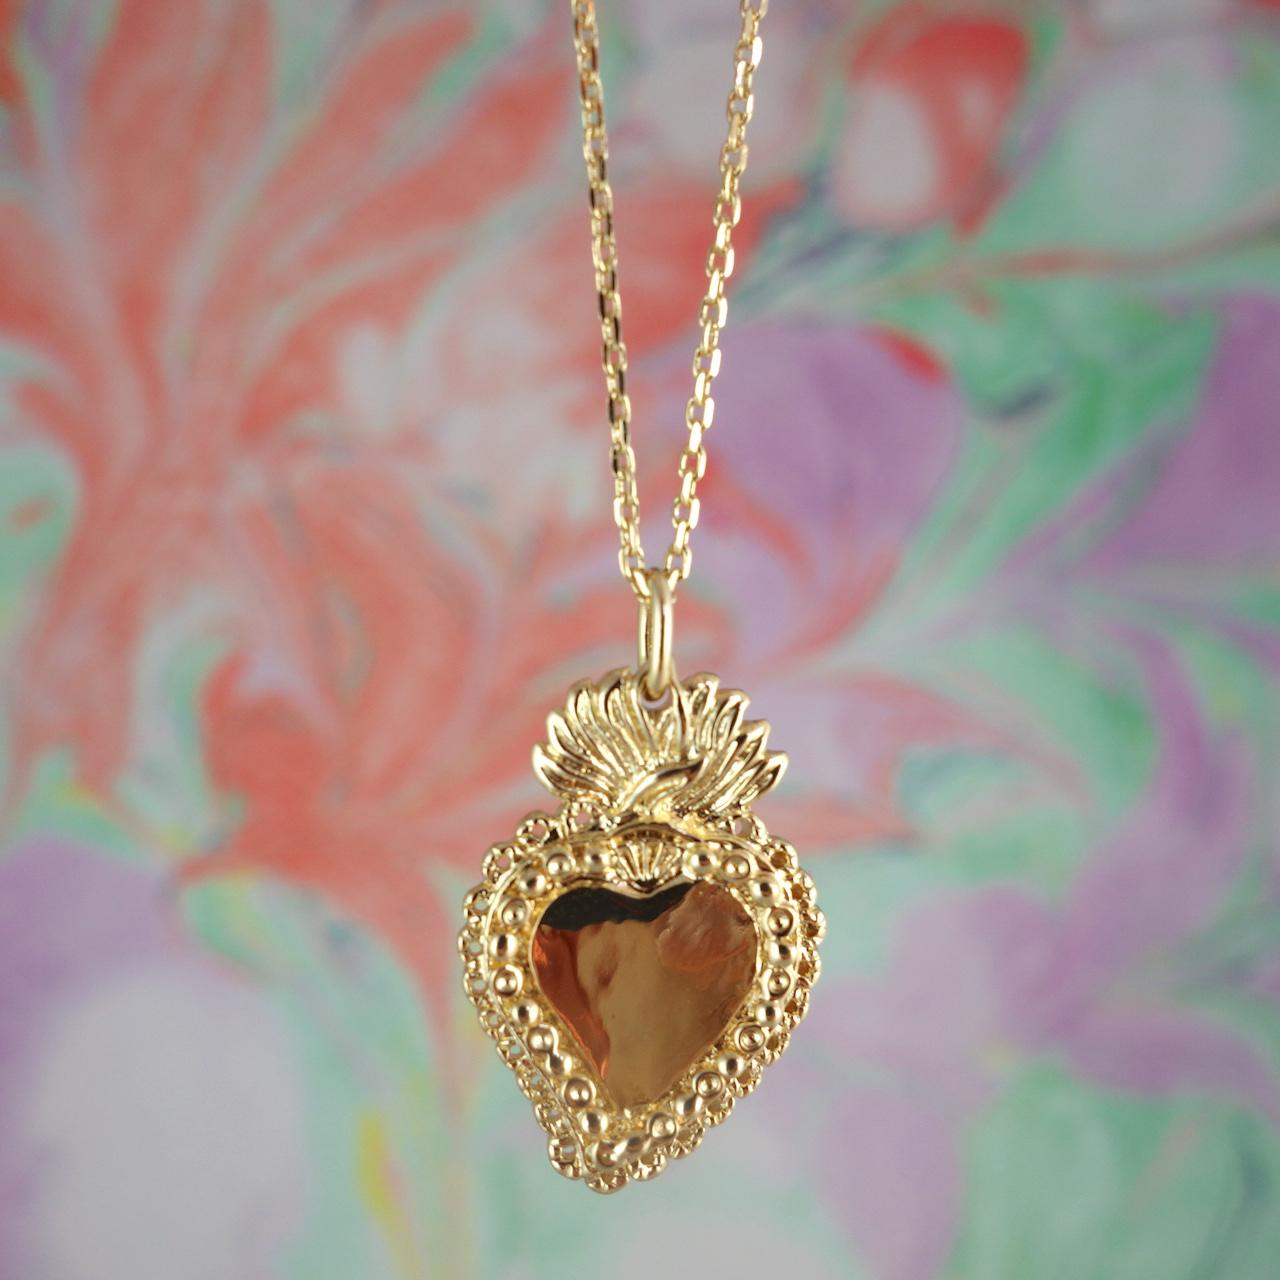 collier-aimee-roulotte-coeur-exvoto-passion-grigri-talisman-amour-romance-plaque-or-photo-macro.